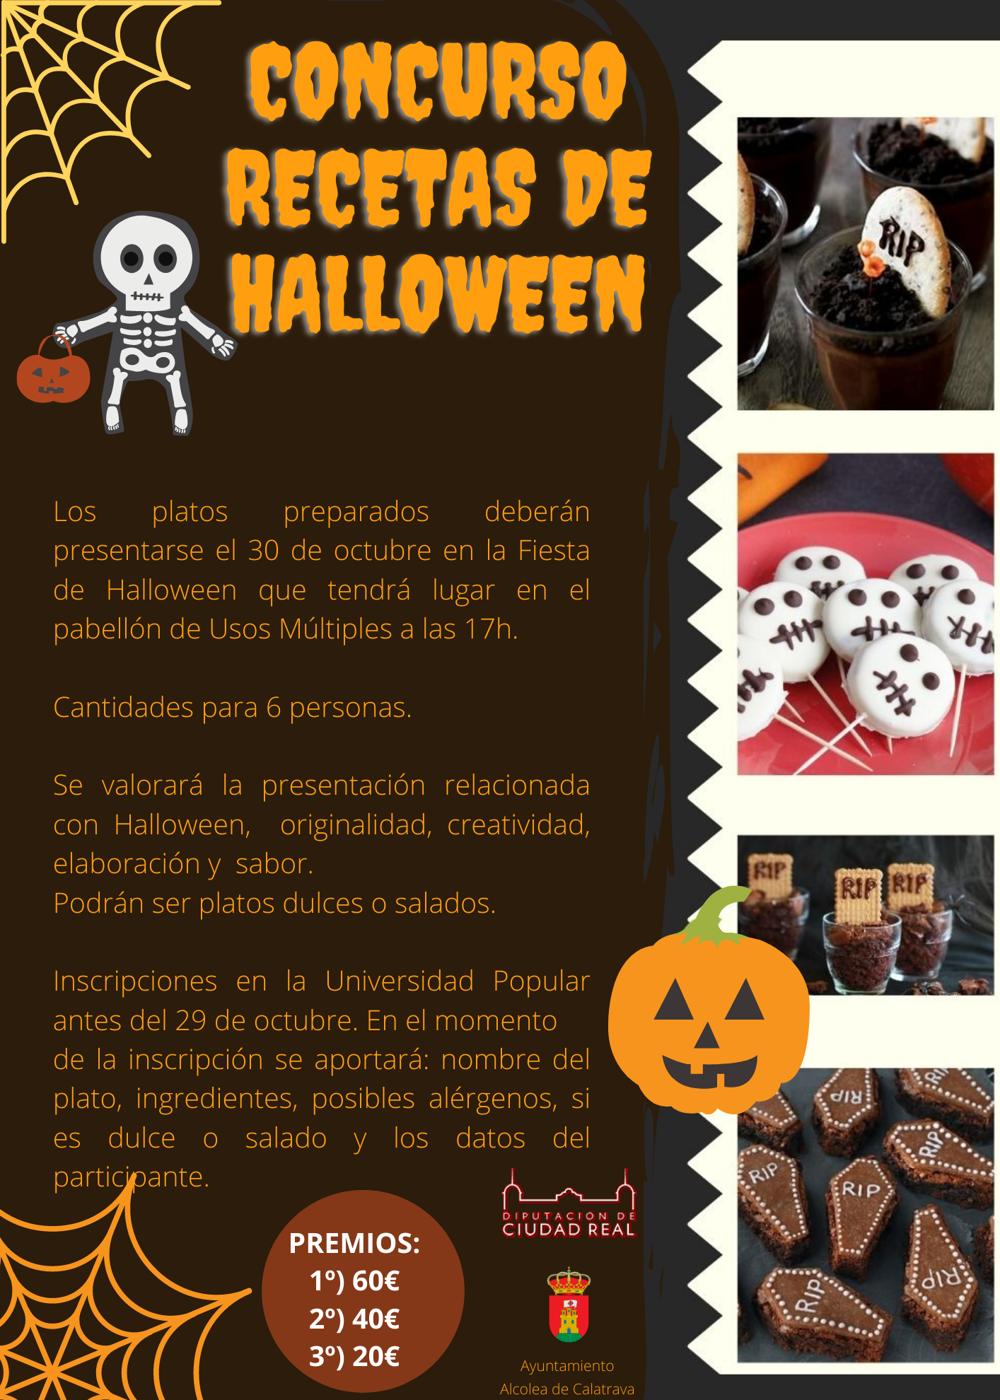 Concurso de Recetas de Halloween